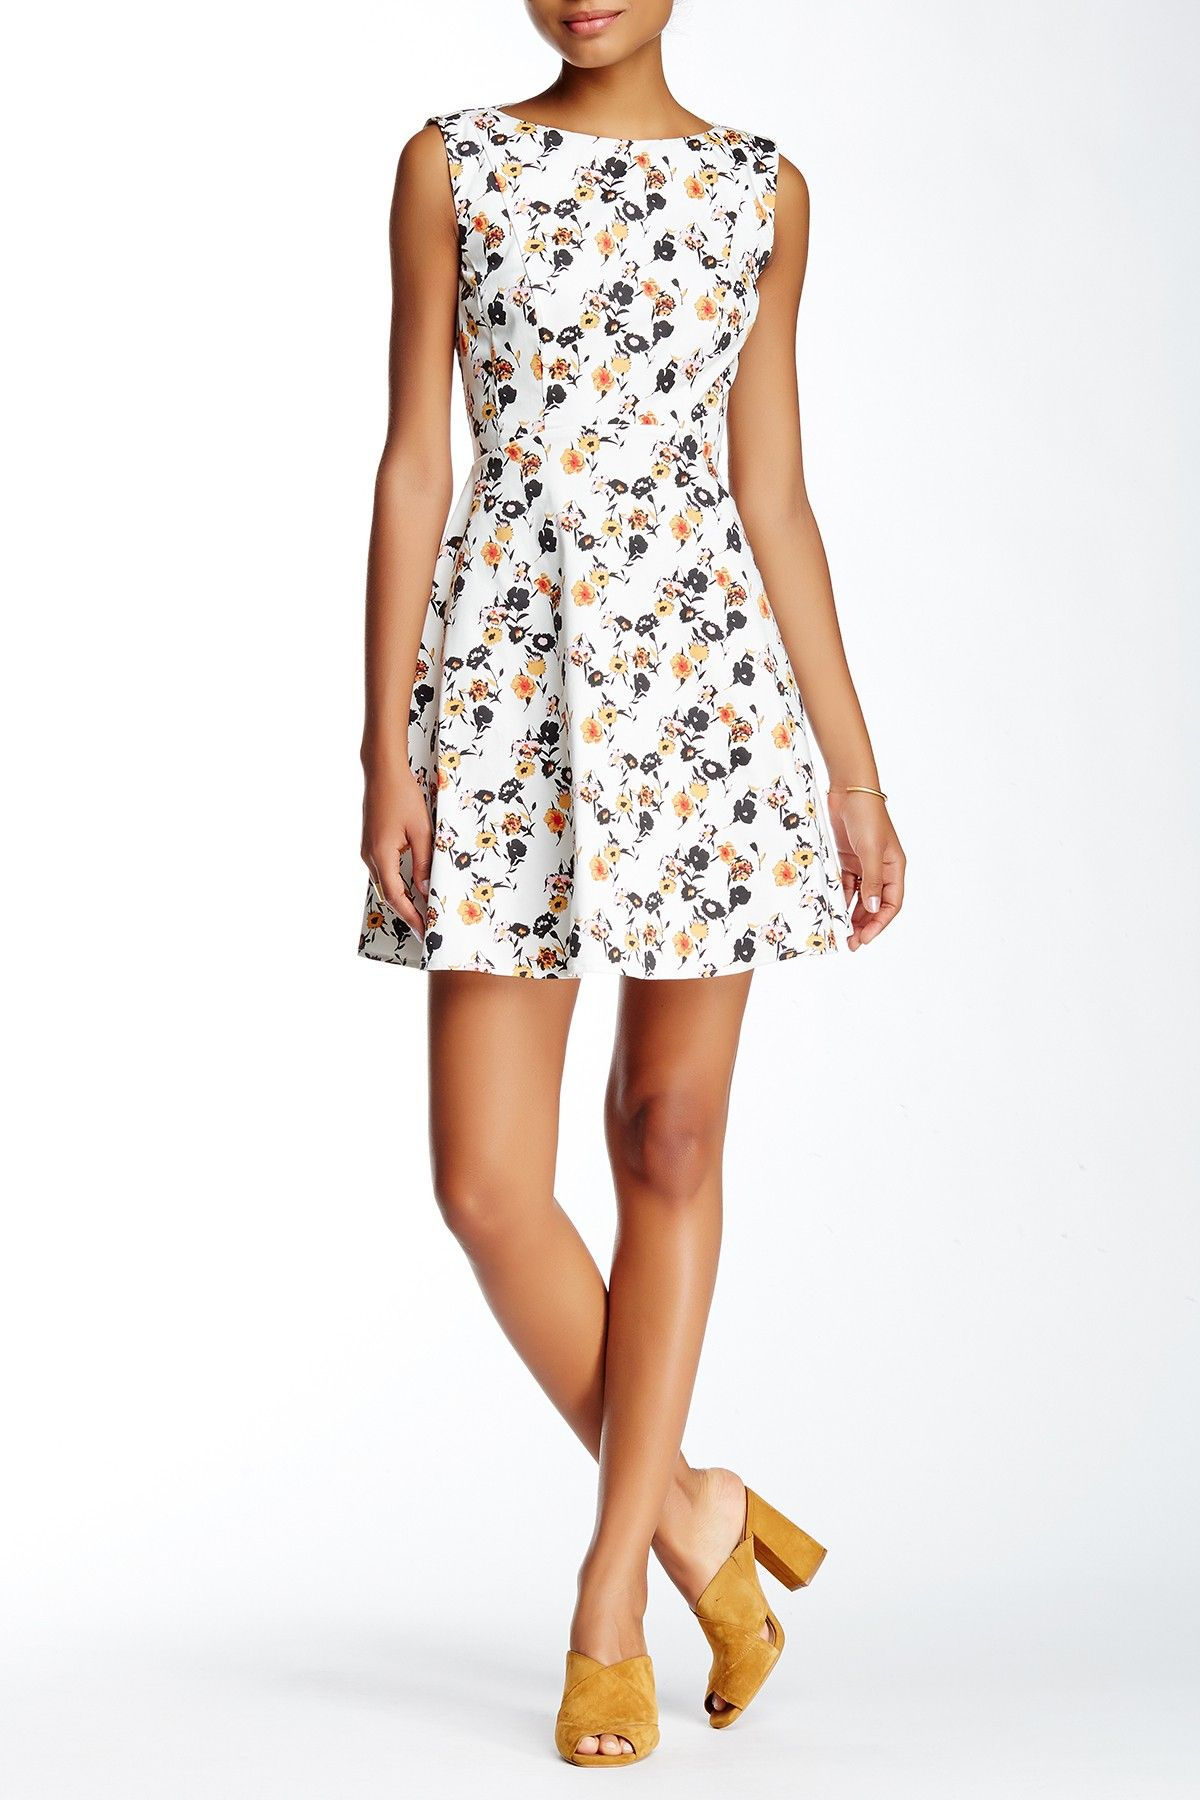 French Connection Sahara Rose Fit Flare Dress Nordstrom Rack Fit Flare Dress Summer Dresses For Women Flare Dress [ 1800 x 1200 Pixel ]